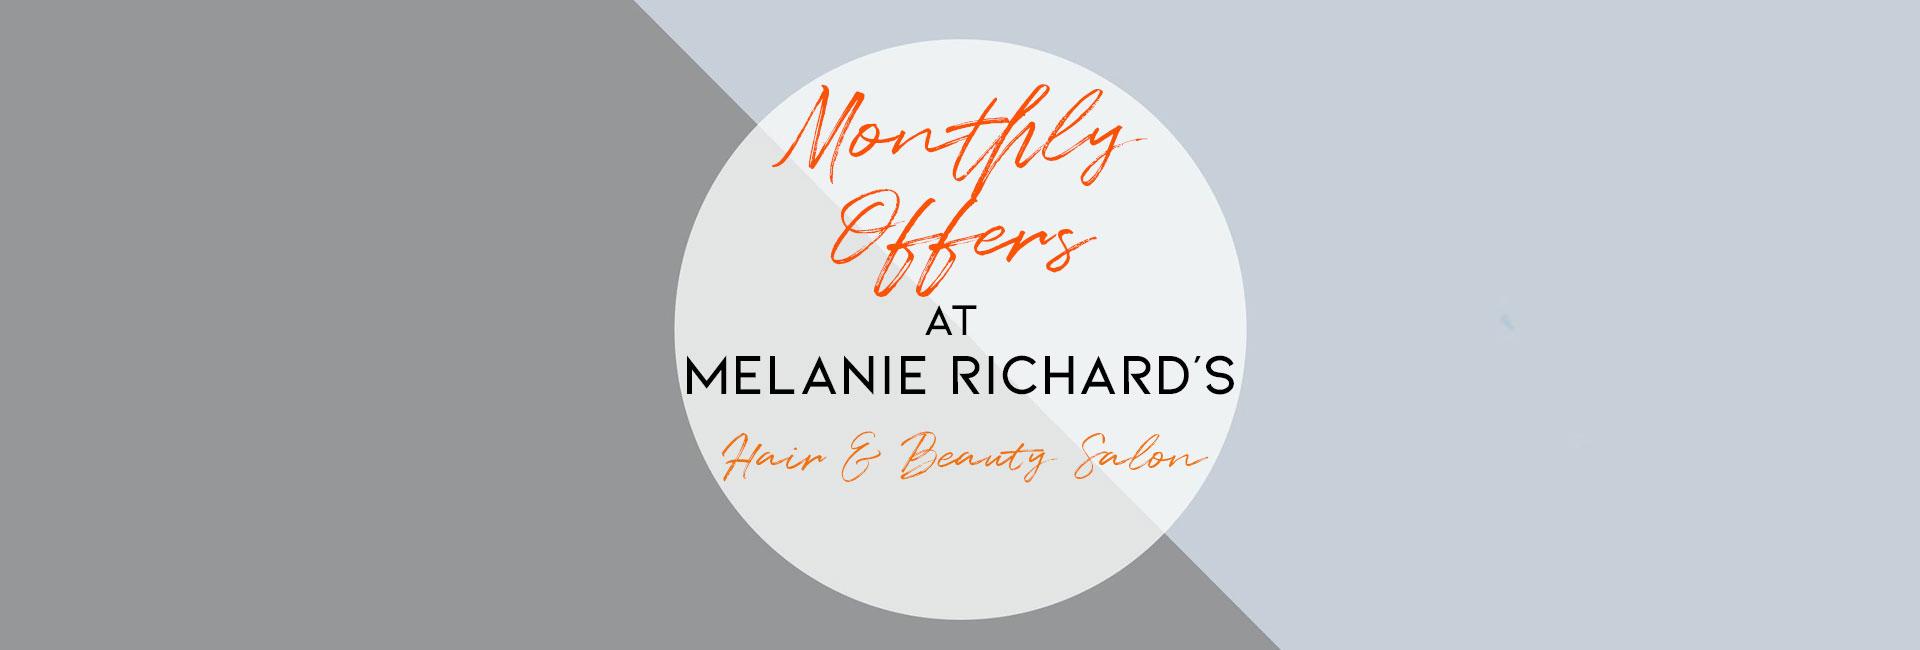 Beauty Promotions & Deals In Peterborough At Melanie Richard's Hair & Beauty Salon